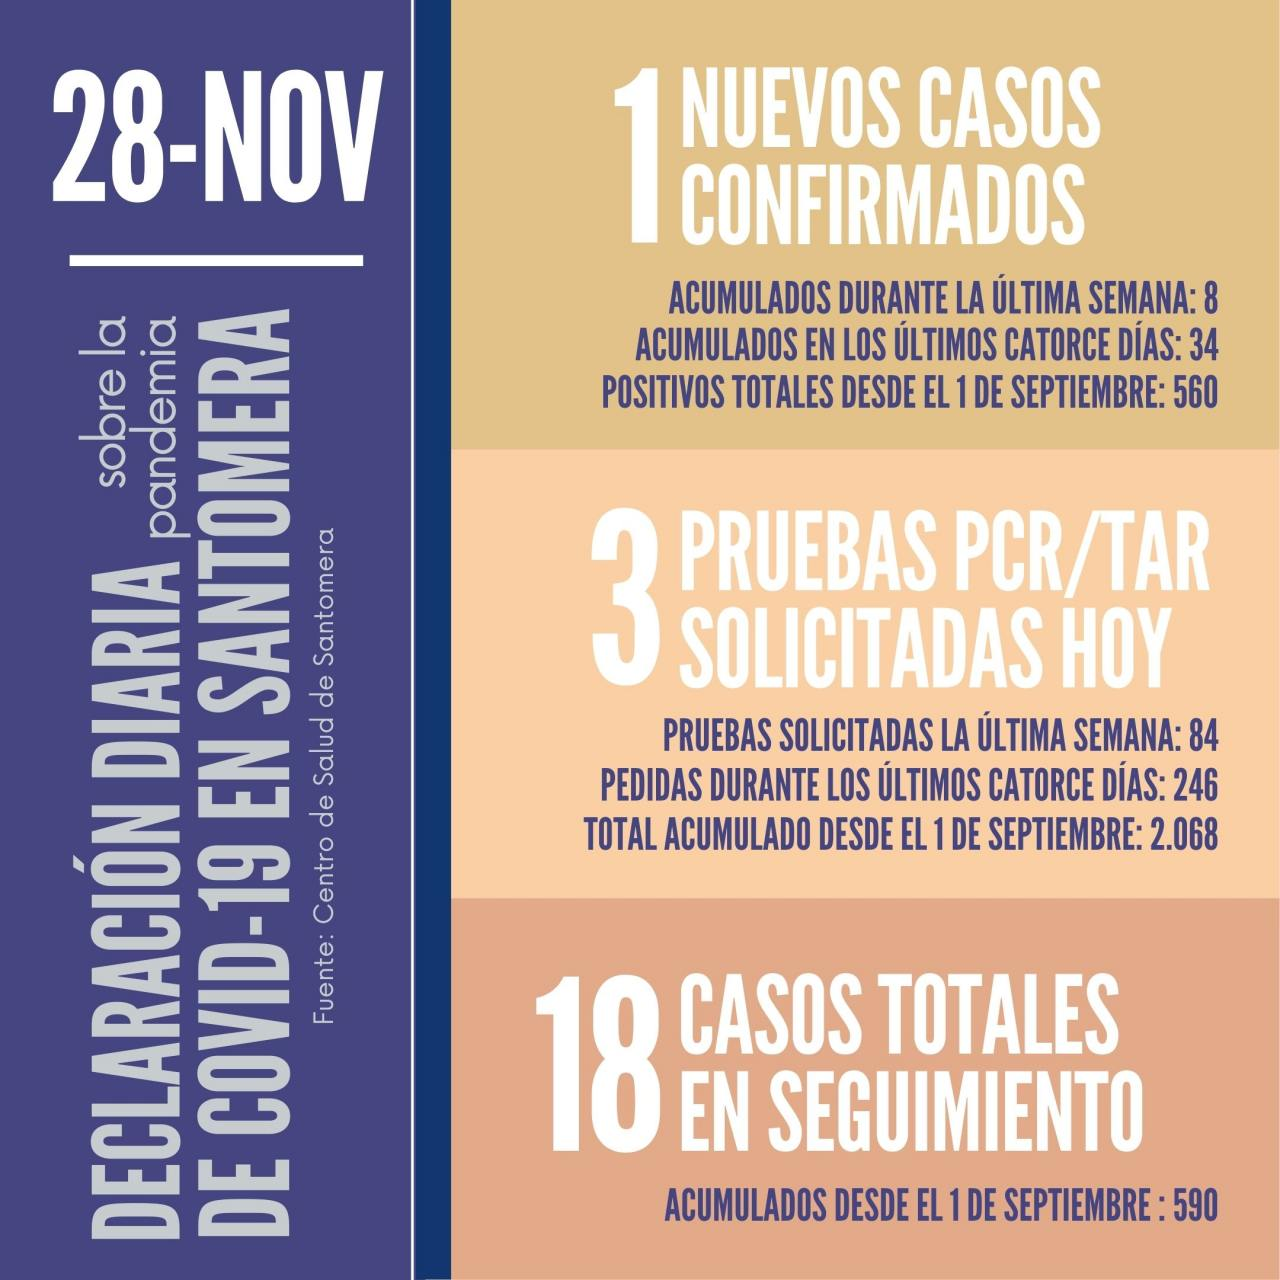 20201128_Datos-COVID-19-Santomera